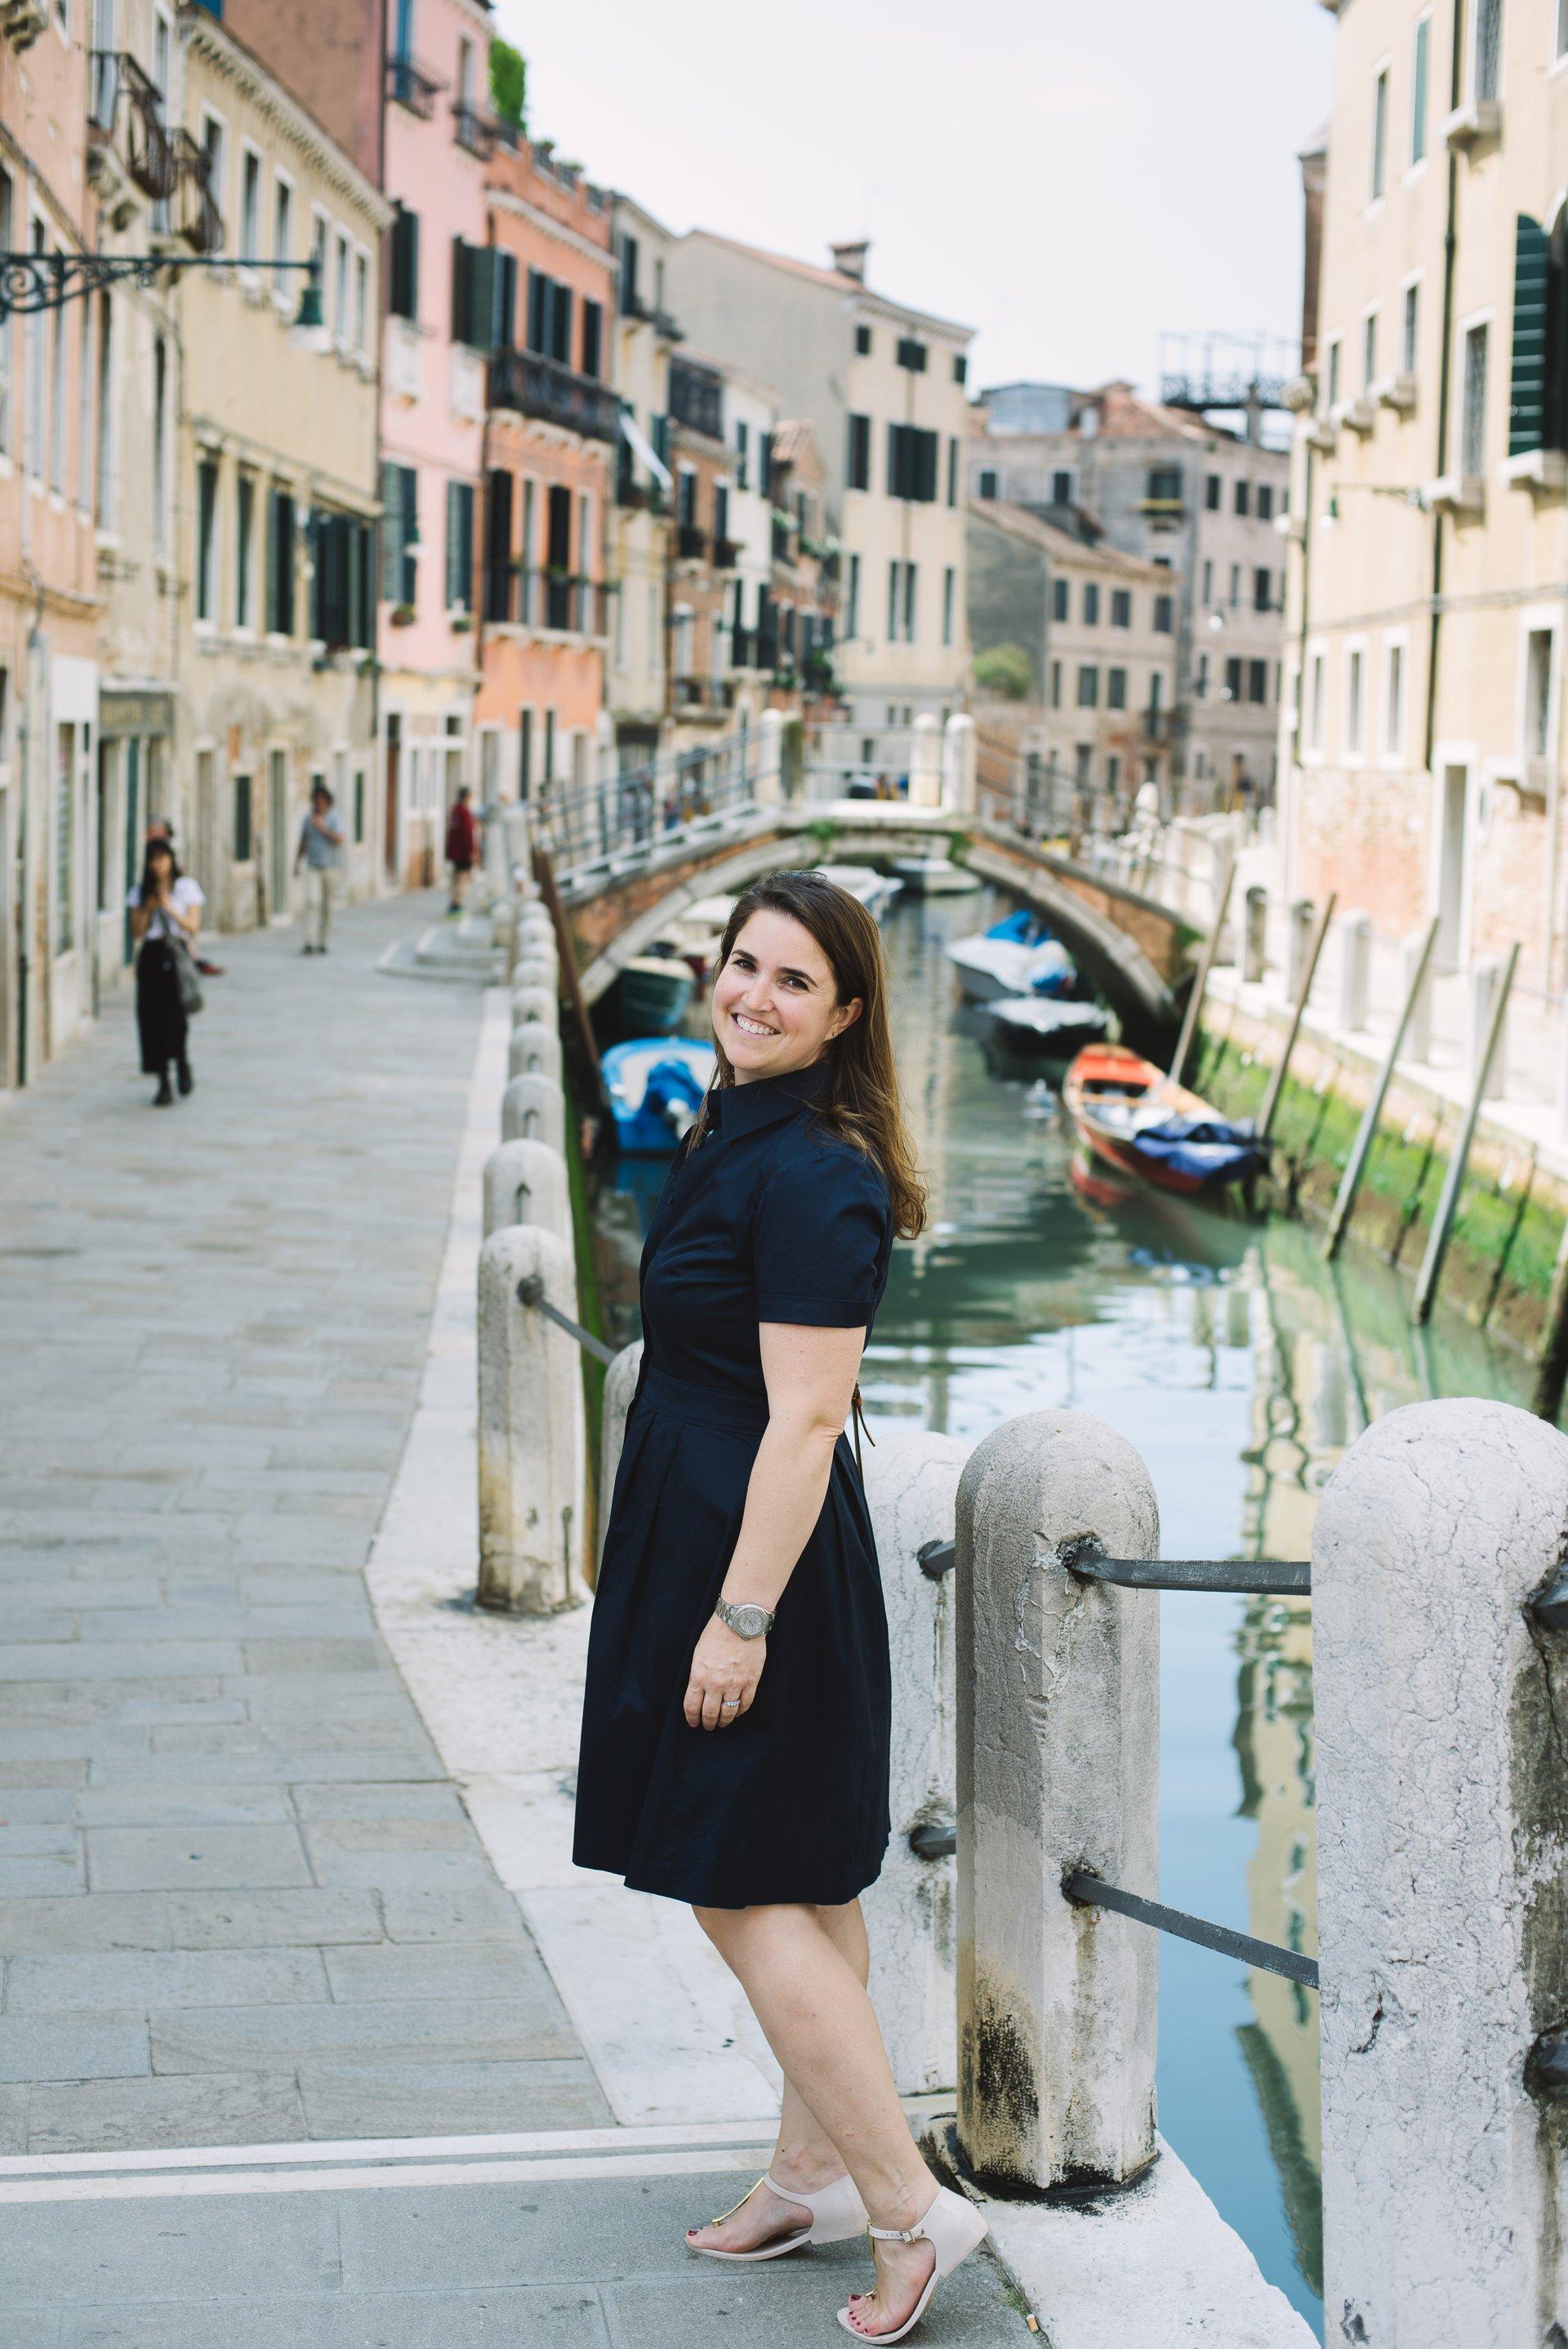 Venice-Italy-travel-story-Flytographer-1